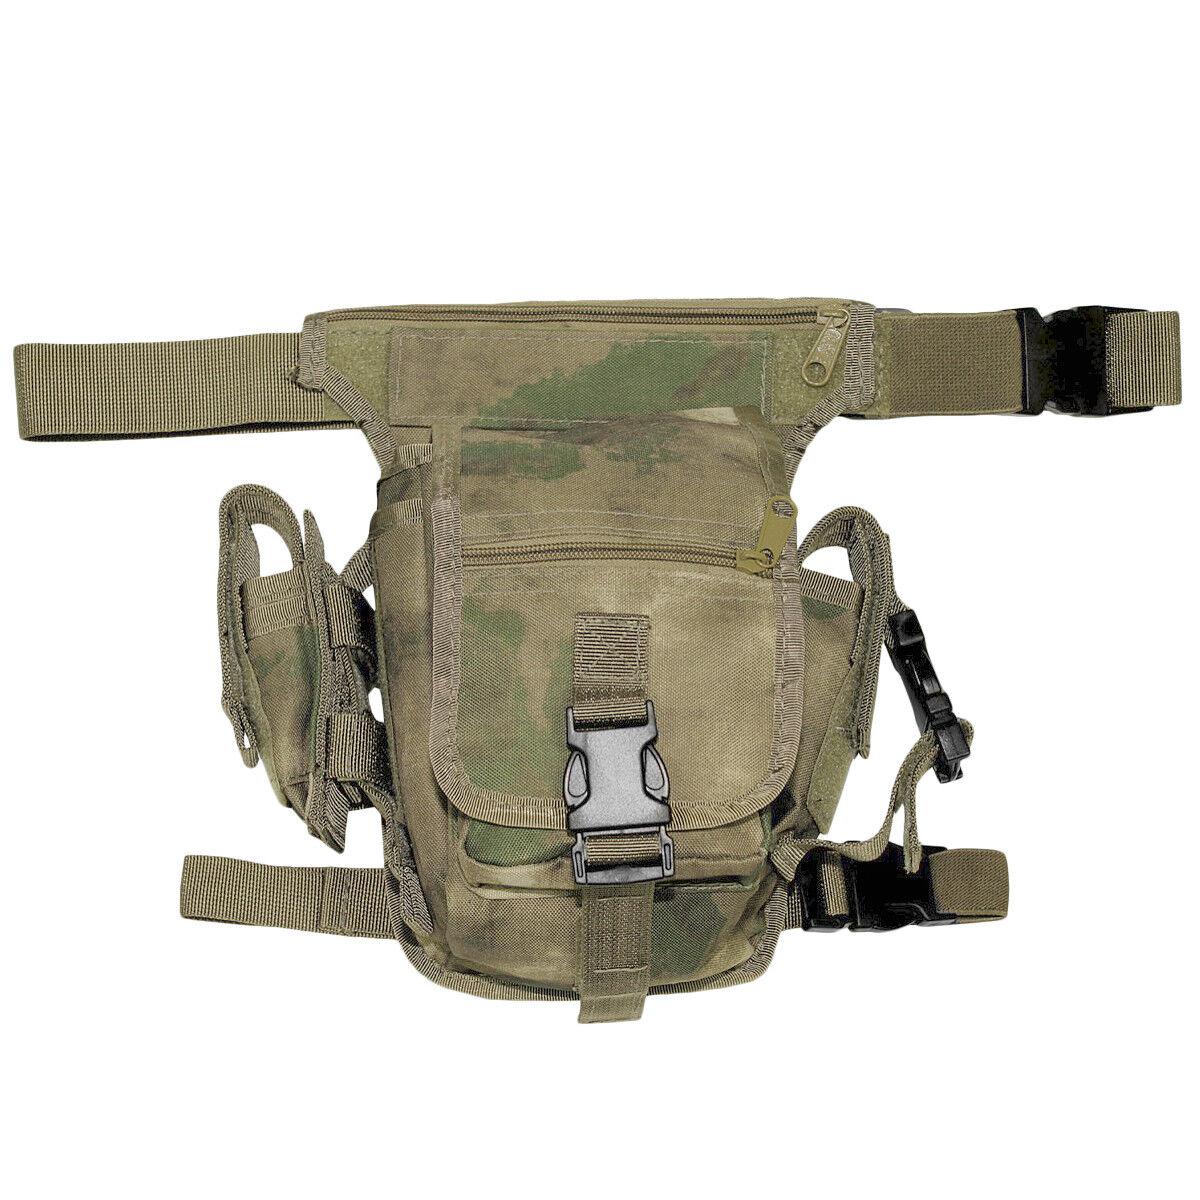 MFH Hip Bag Army Style Combat Patrol Trekking Hunting Airsoft Travel HDT Camo FG